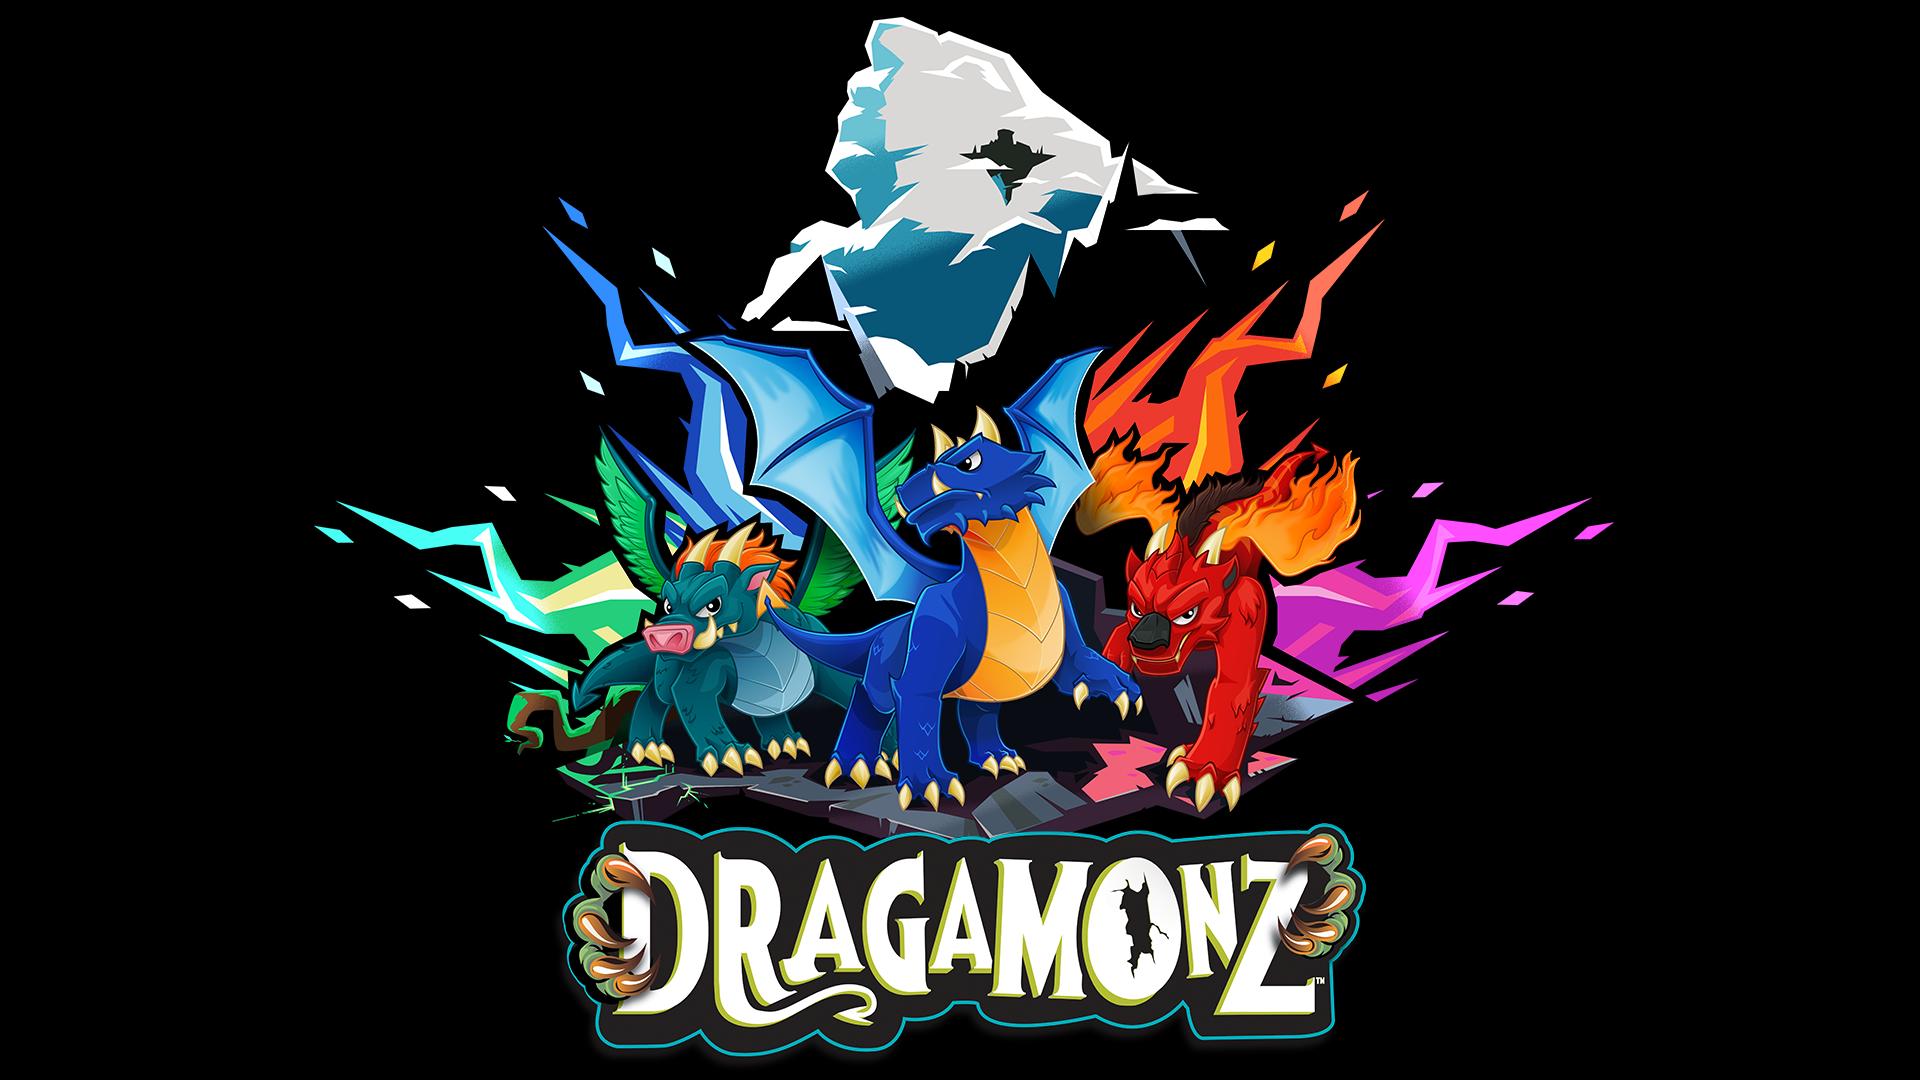 Dragamonz - Mini Series